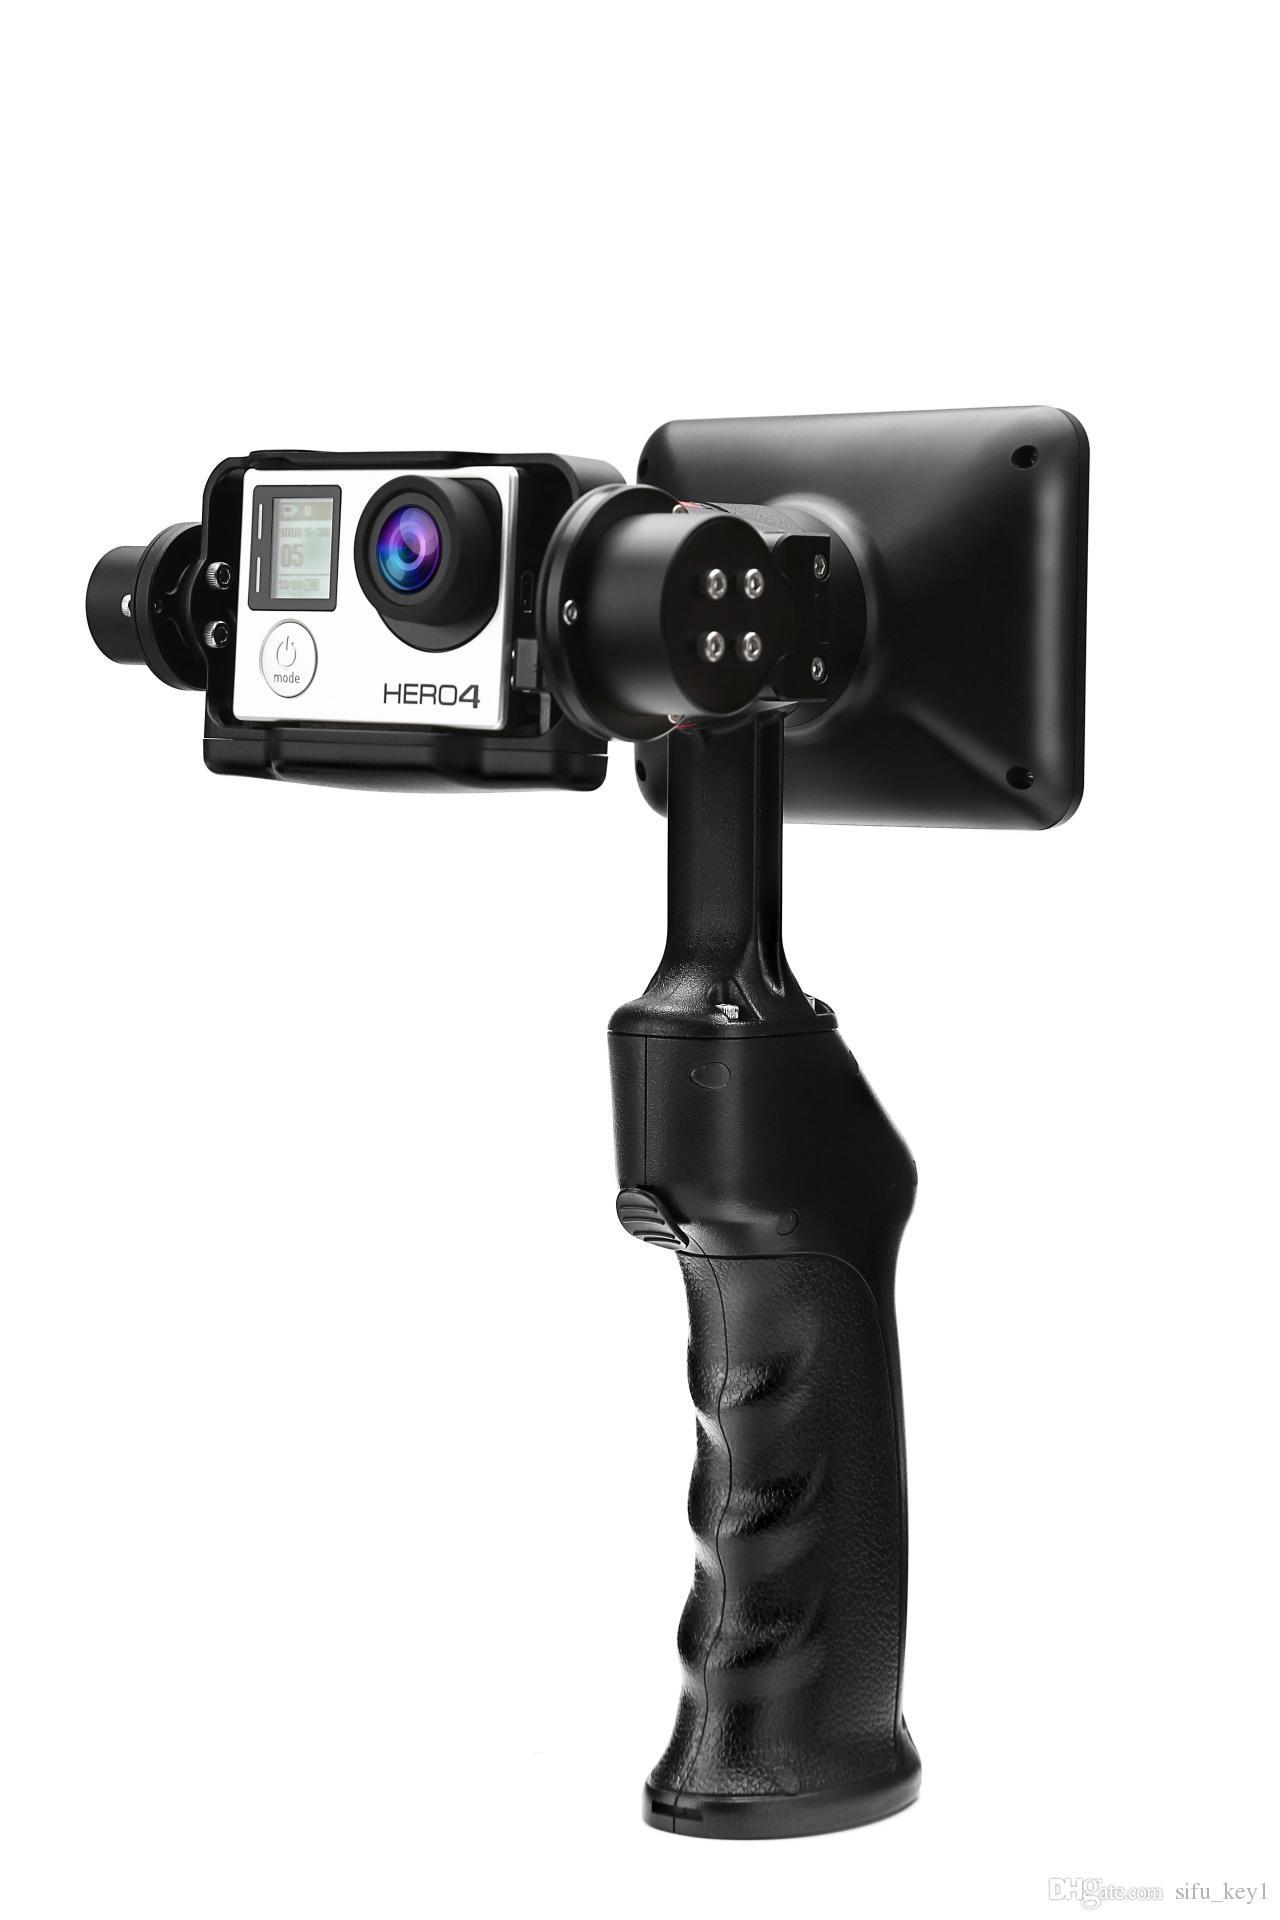 online cheap wenpod gp1 hand held gimbal selfie stick fit for action camera g. Black Bedroom Furniture Sets. Home Design Ideas